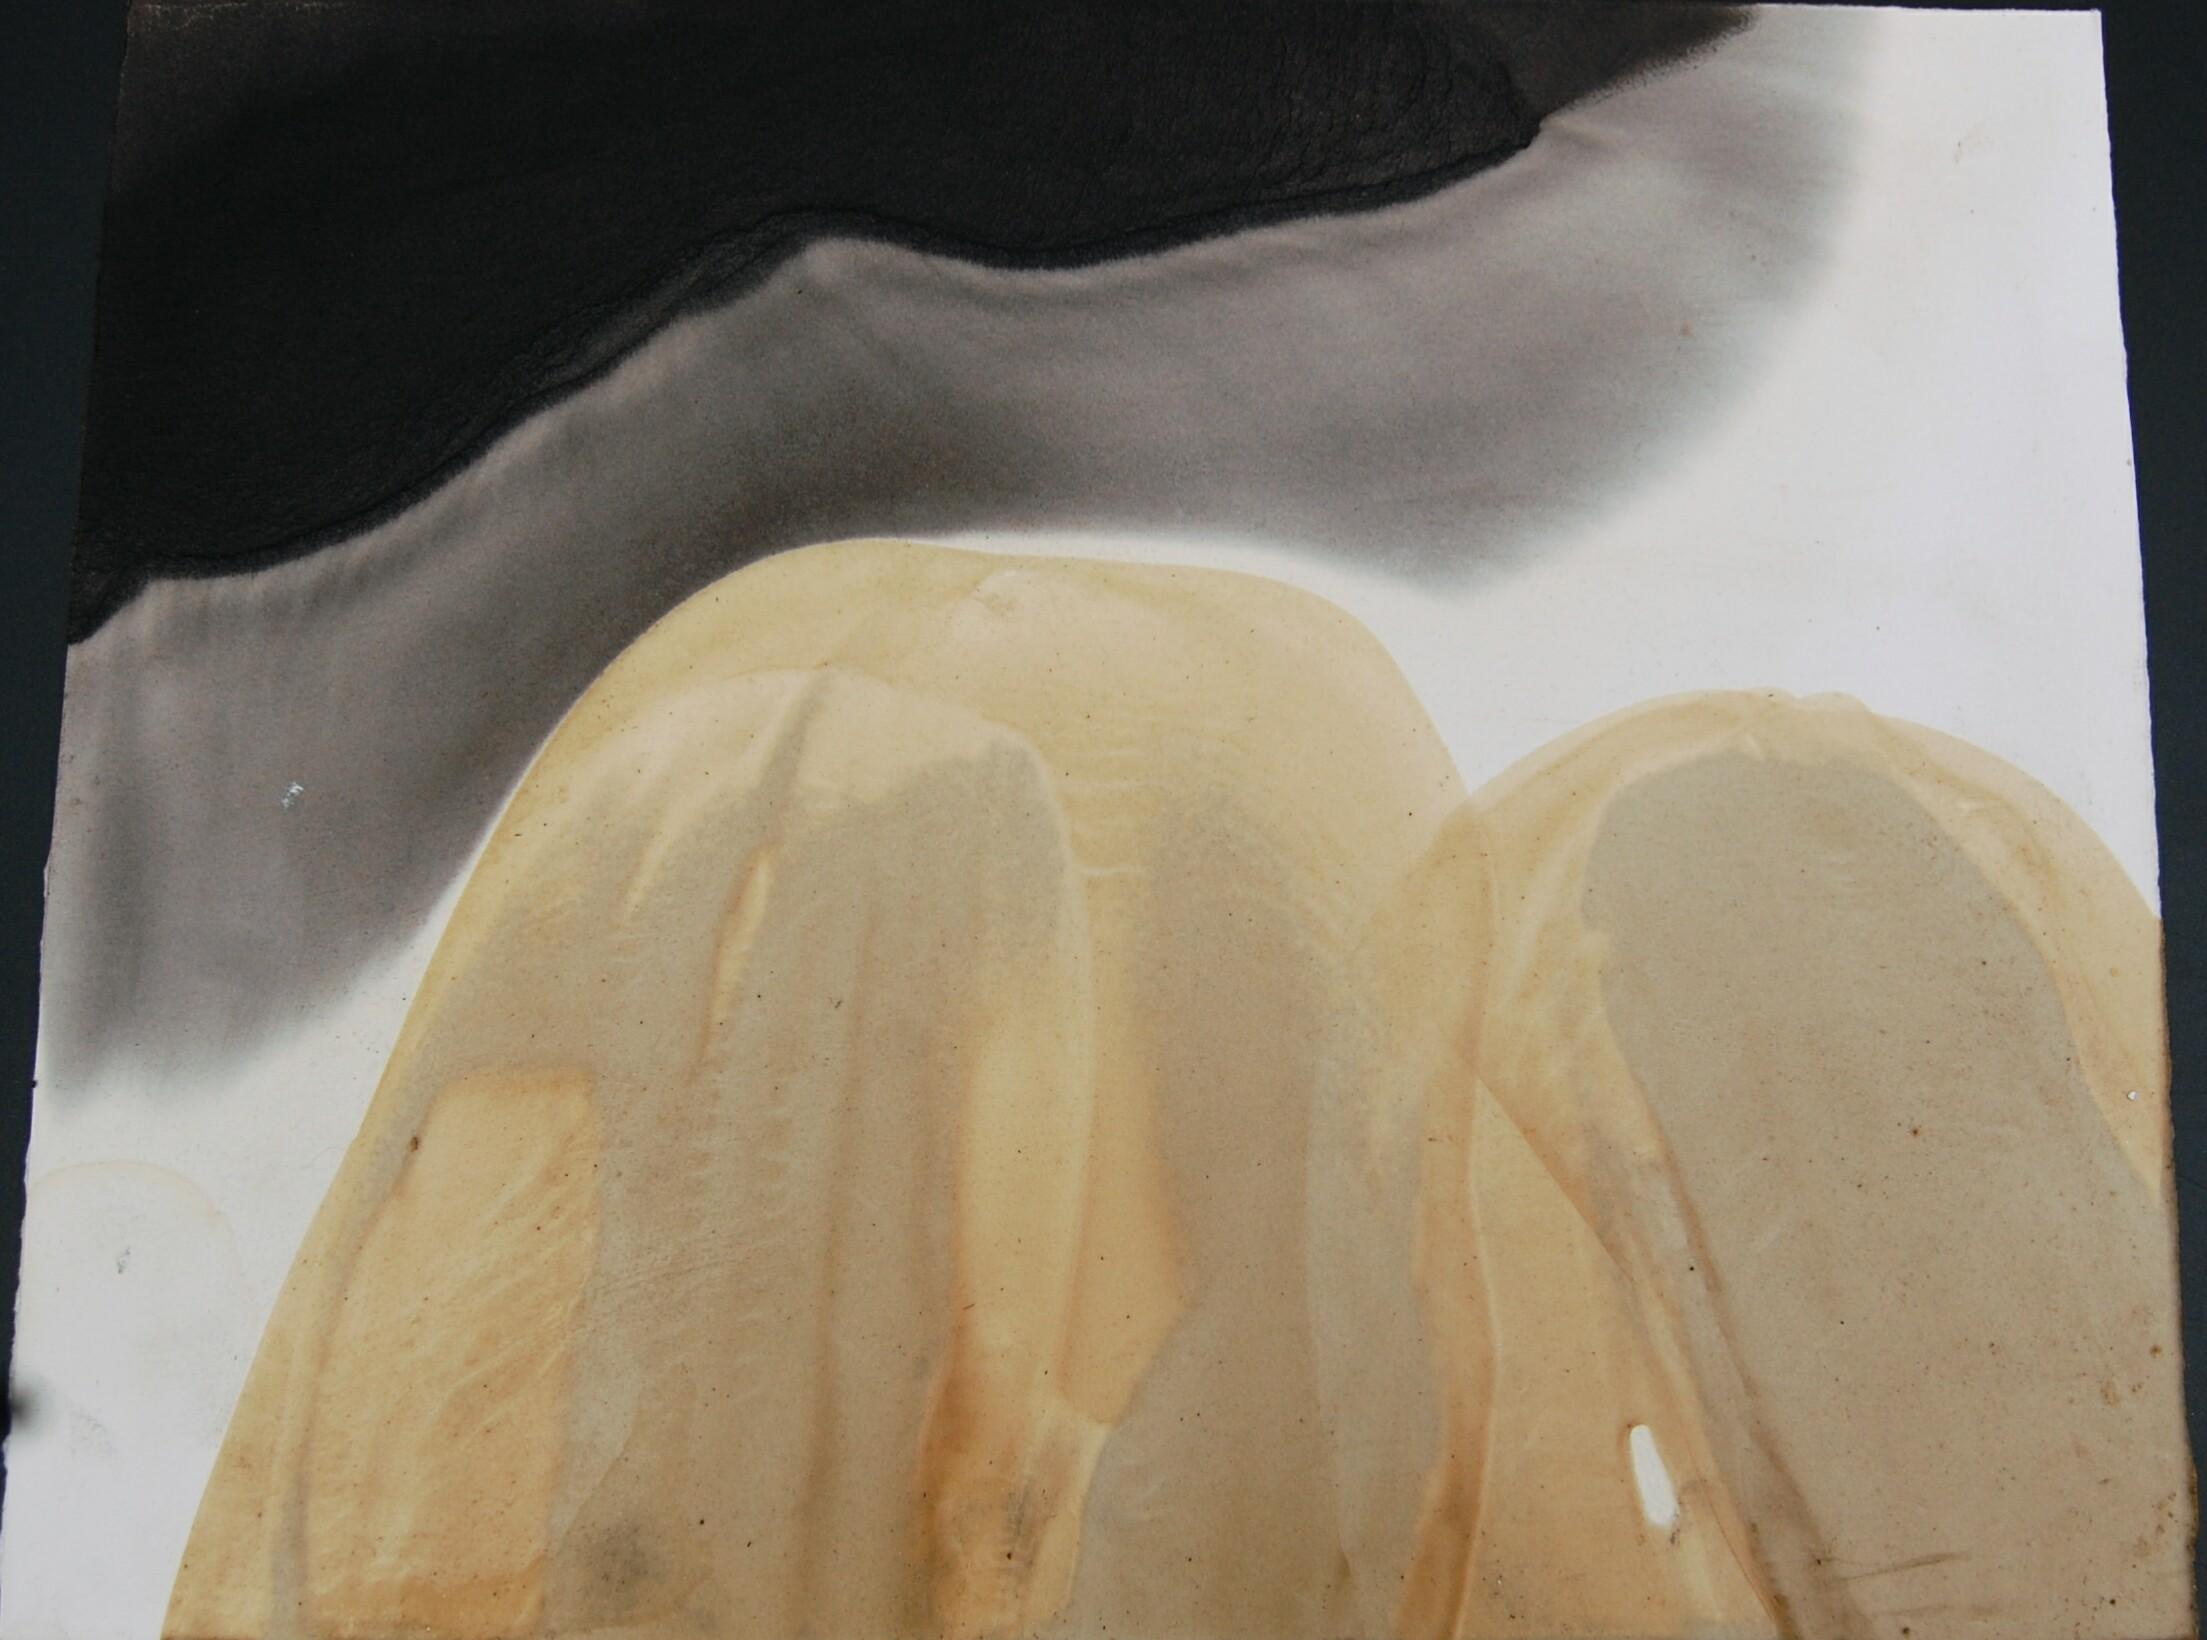 Cire et huile 50x40 2013